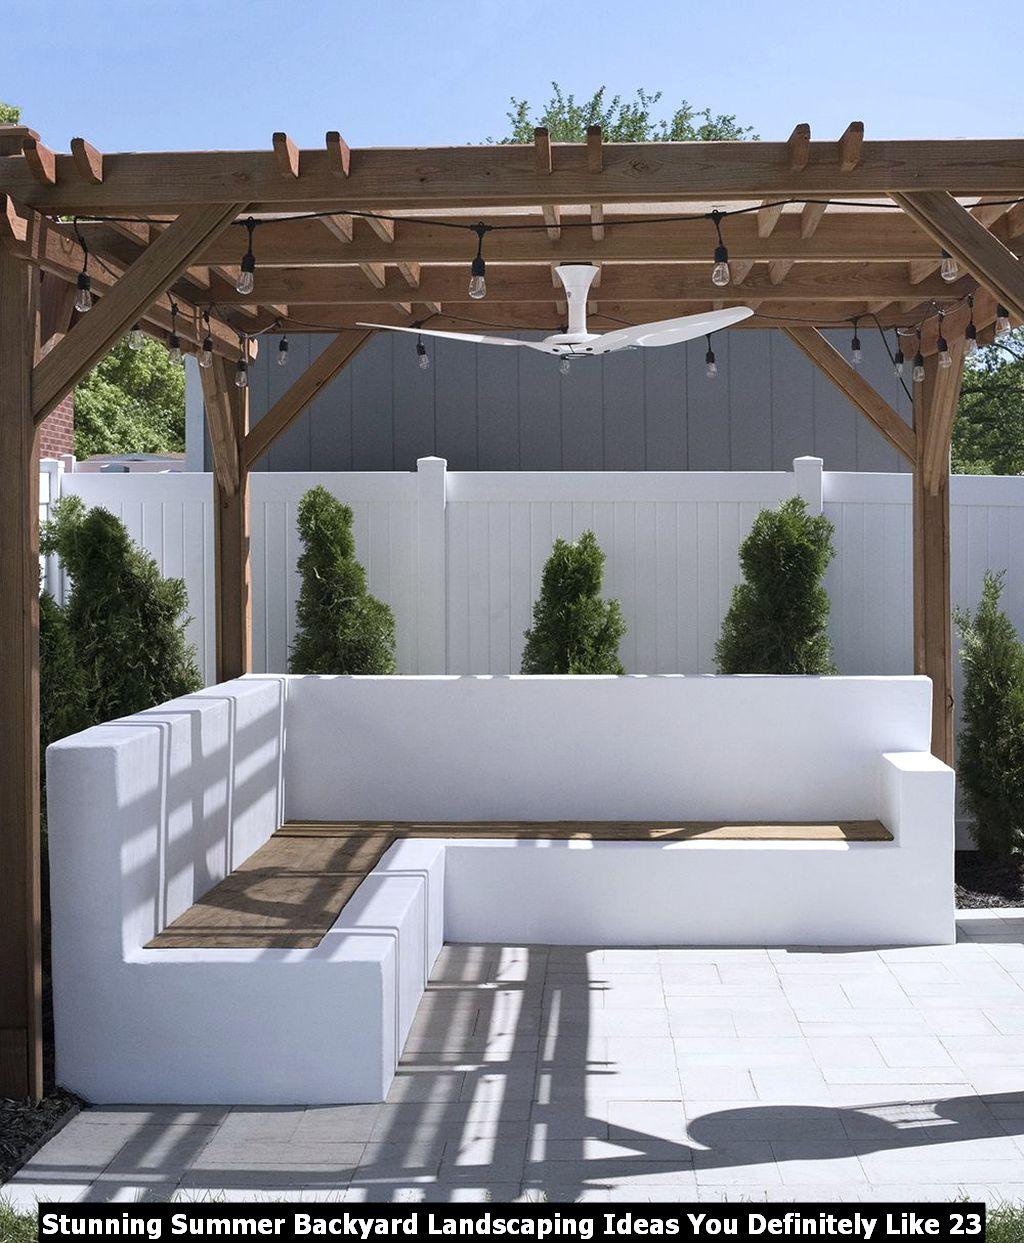 Stunning Summer Backyard Landscaping Ideas You Definitely Like 23